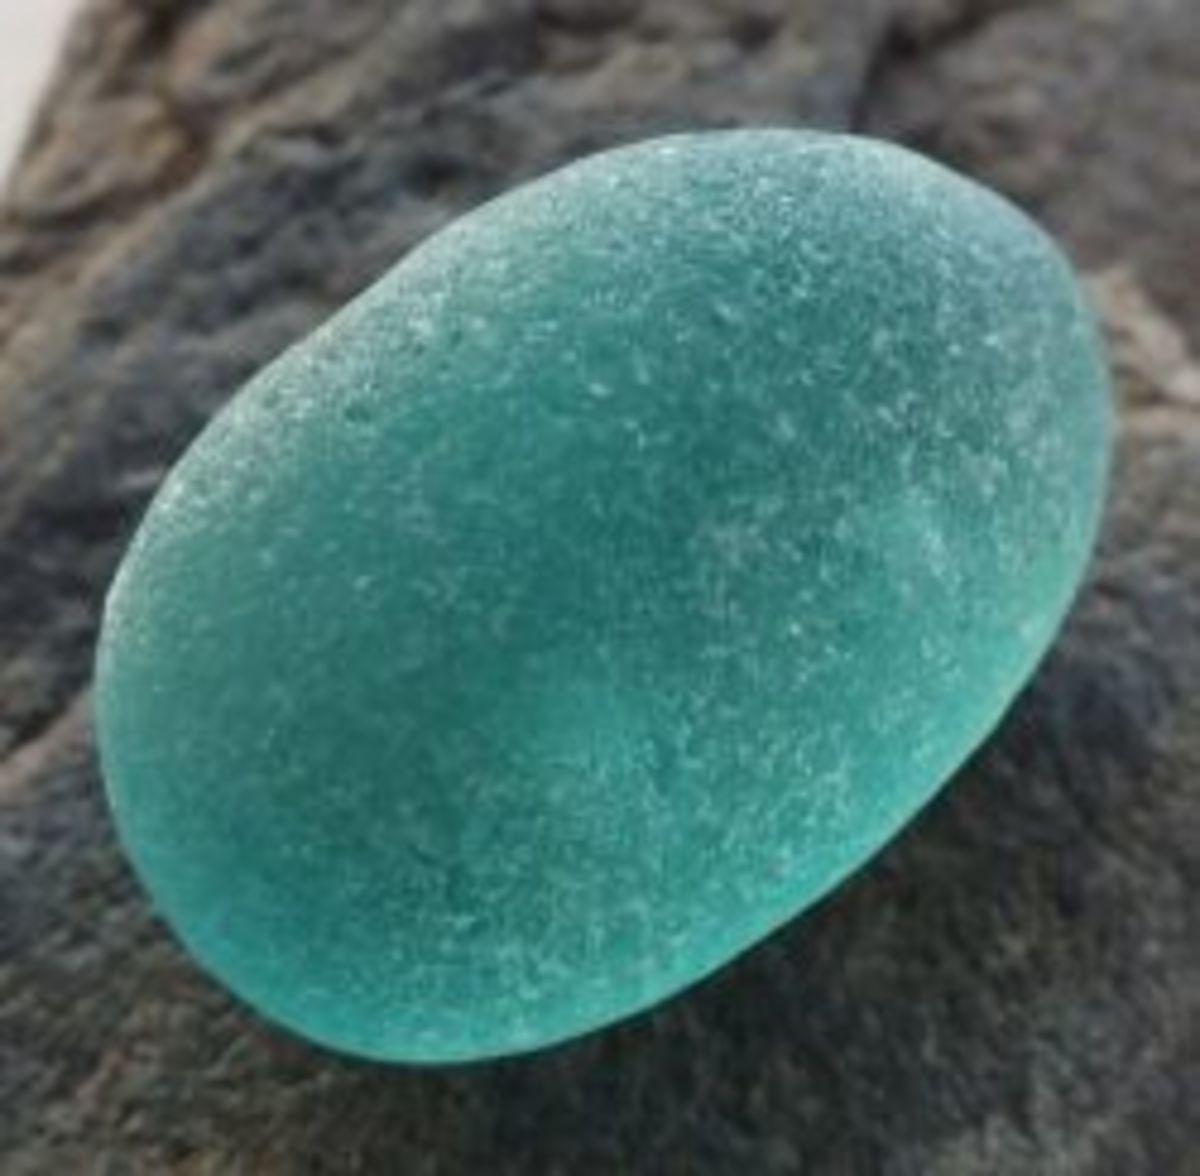 Natural Beach Combed Sea Glass: A Vanishing Treasure